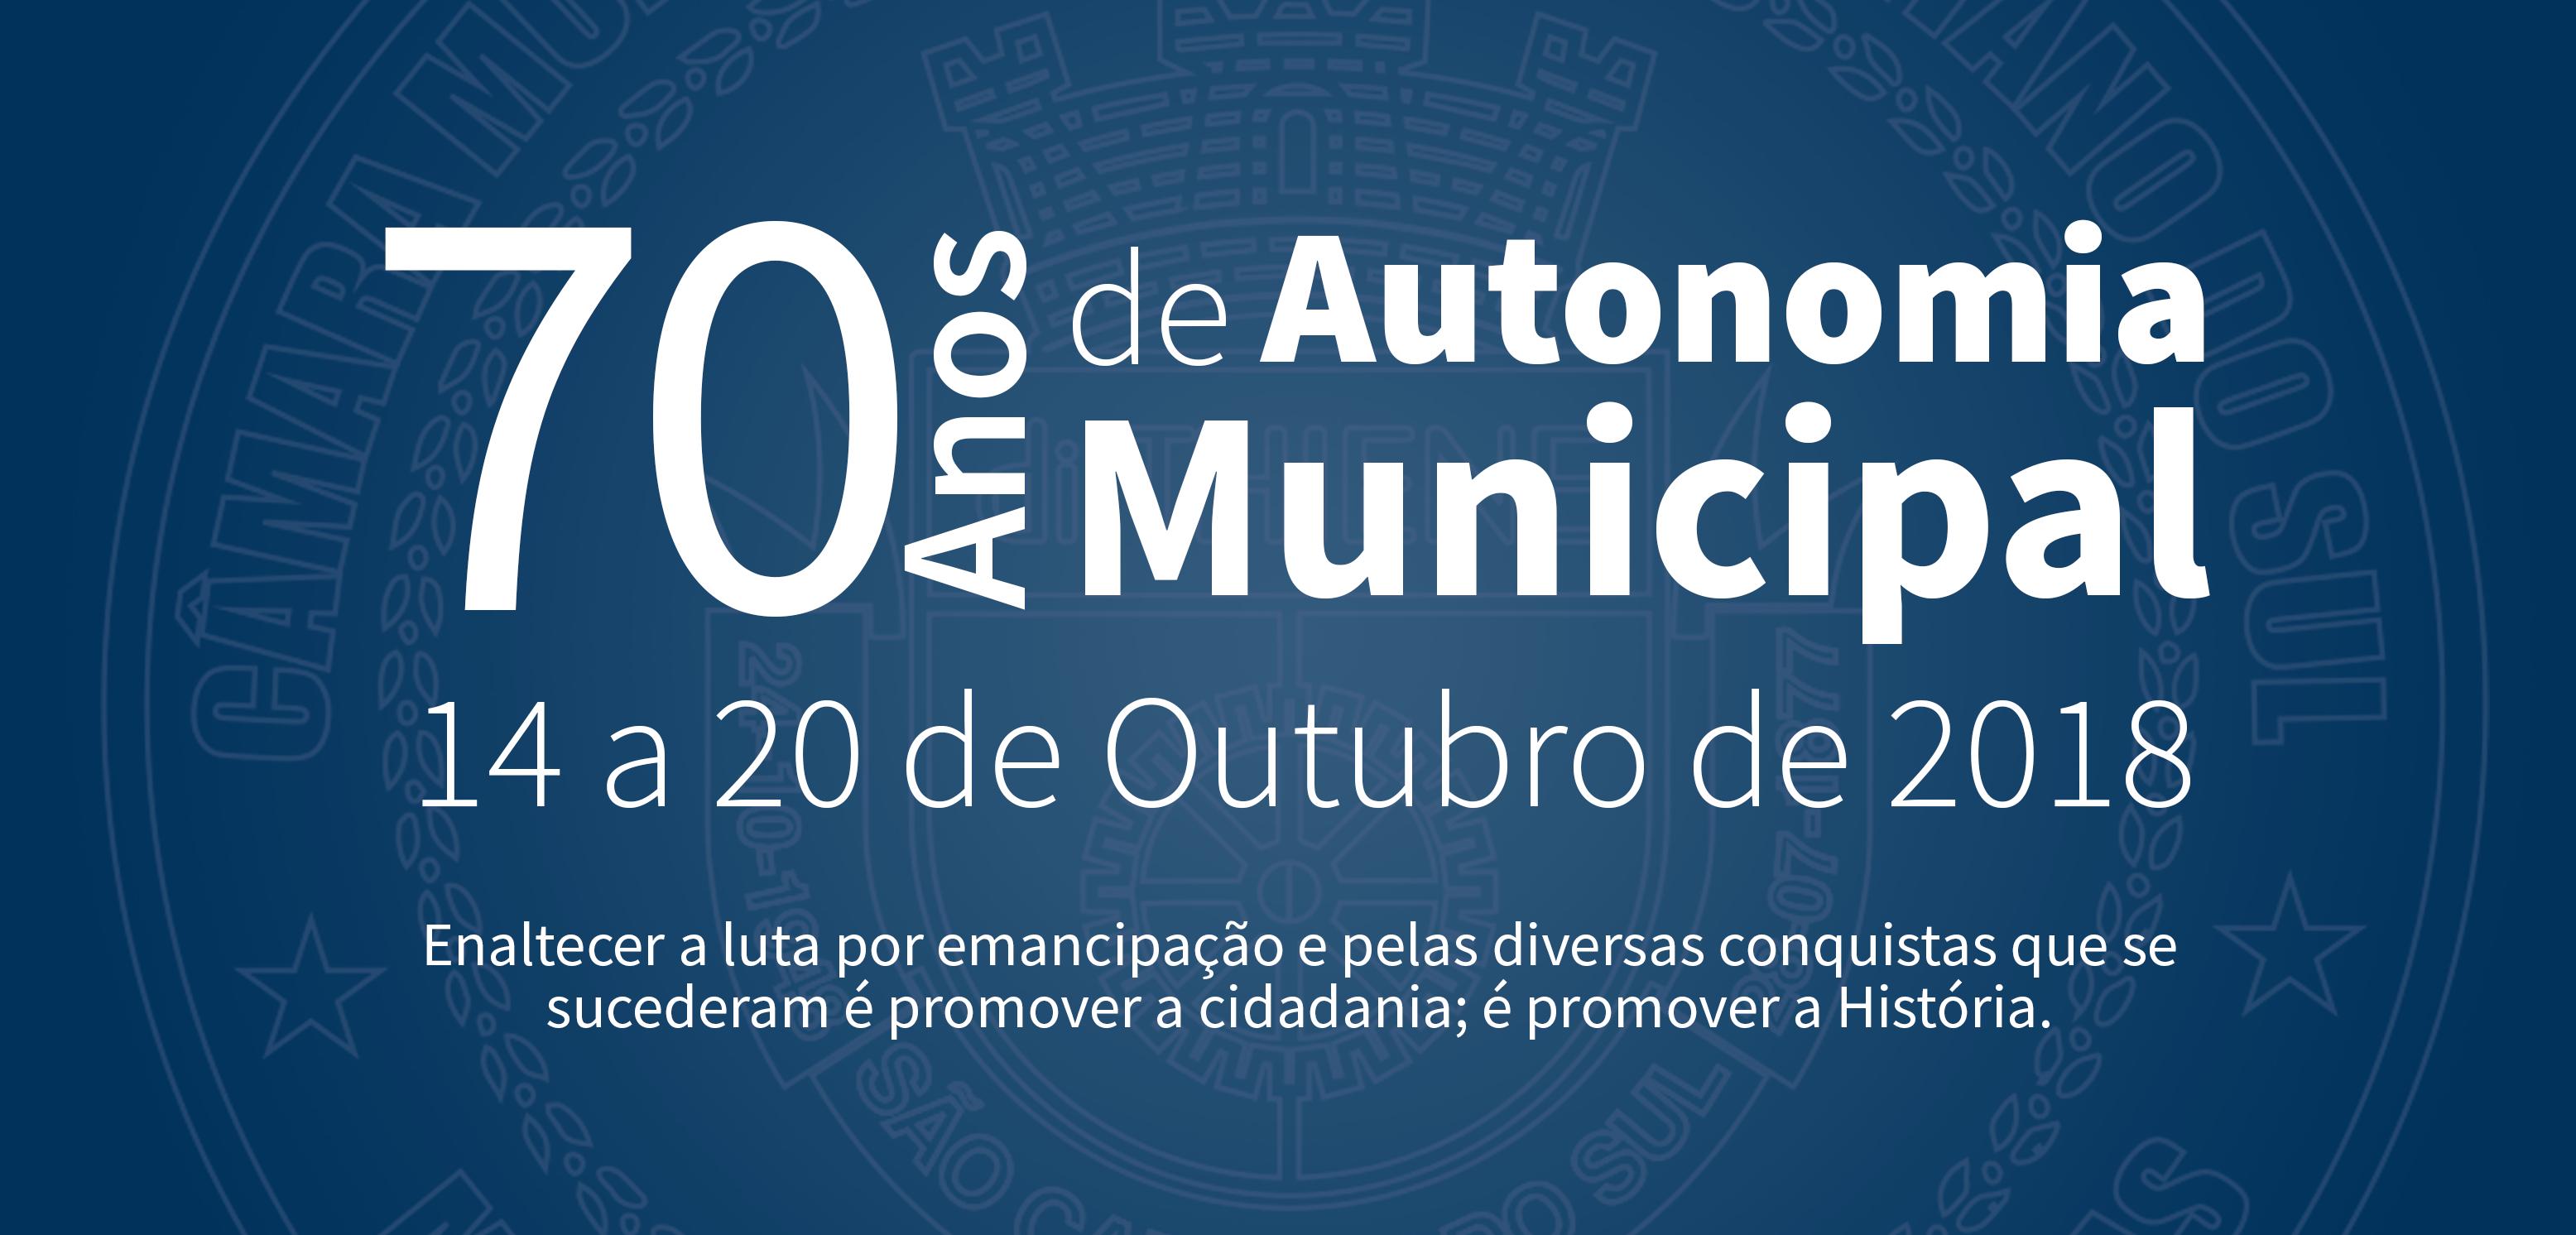 Semana da Autonomia Municipal